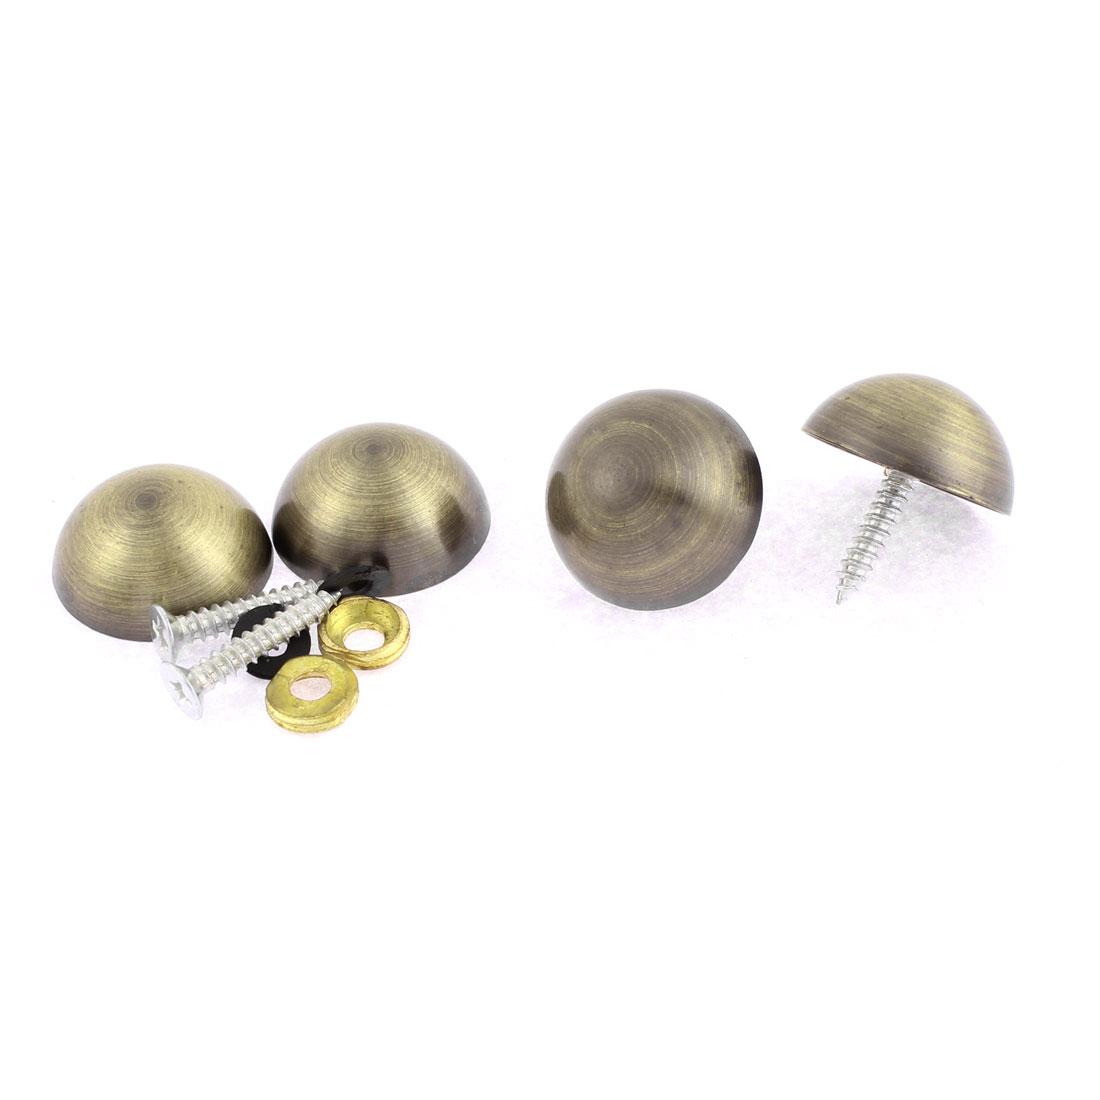 4pcs 23mm Dia Metal Semicircle Glass Mirror Screw Nail Decor Bronze Tone